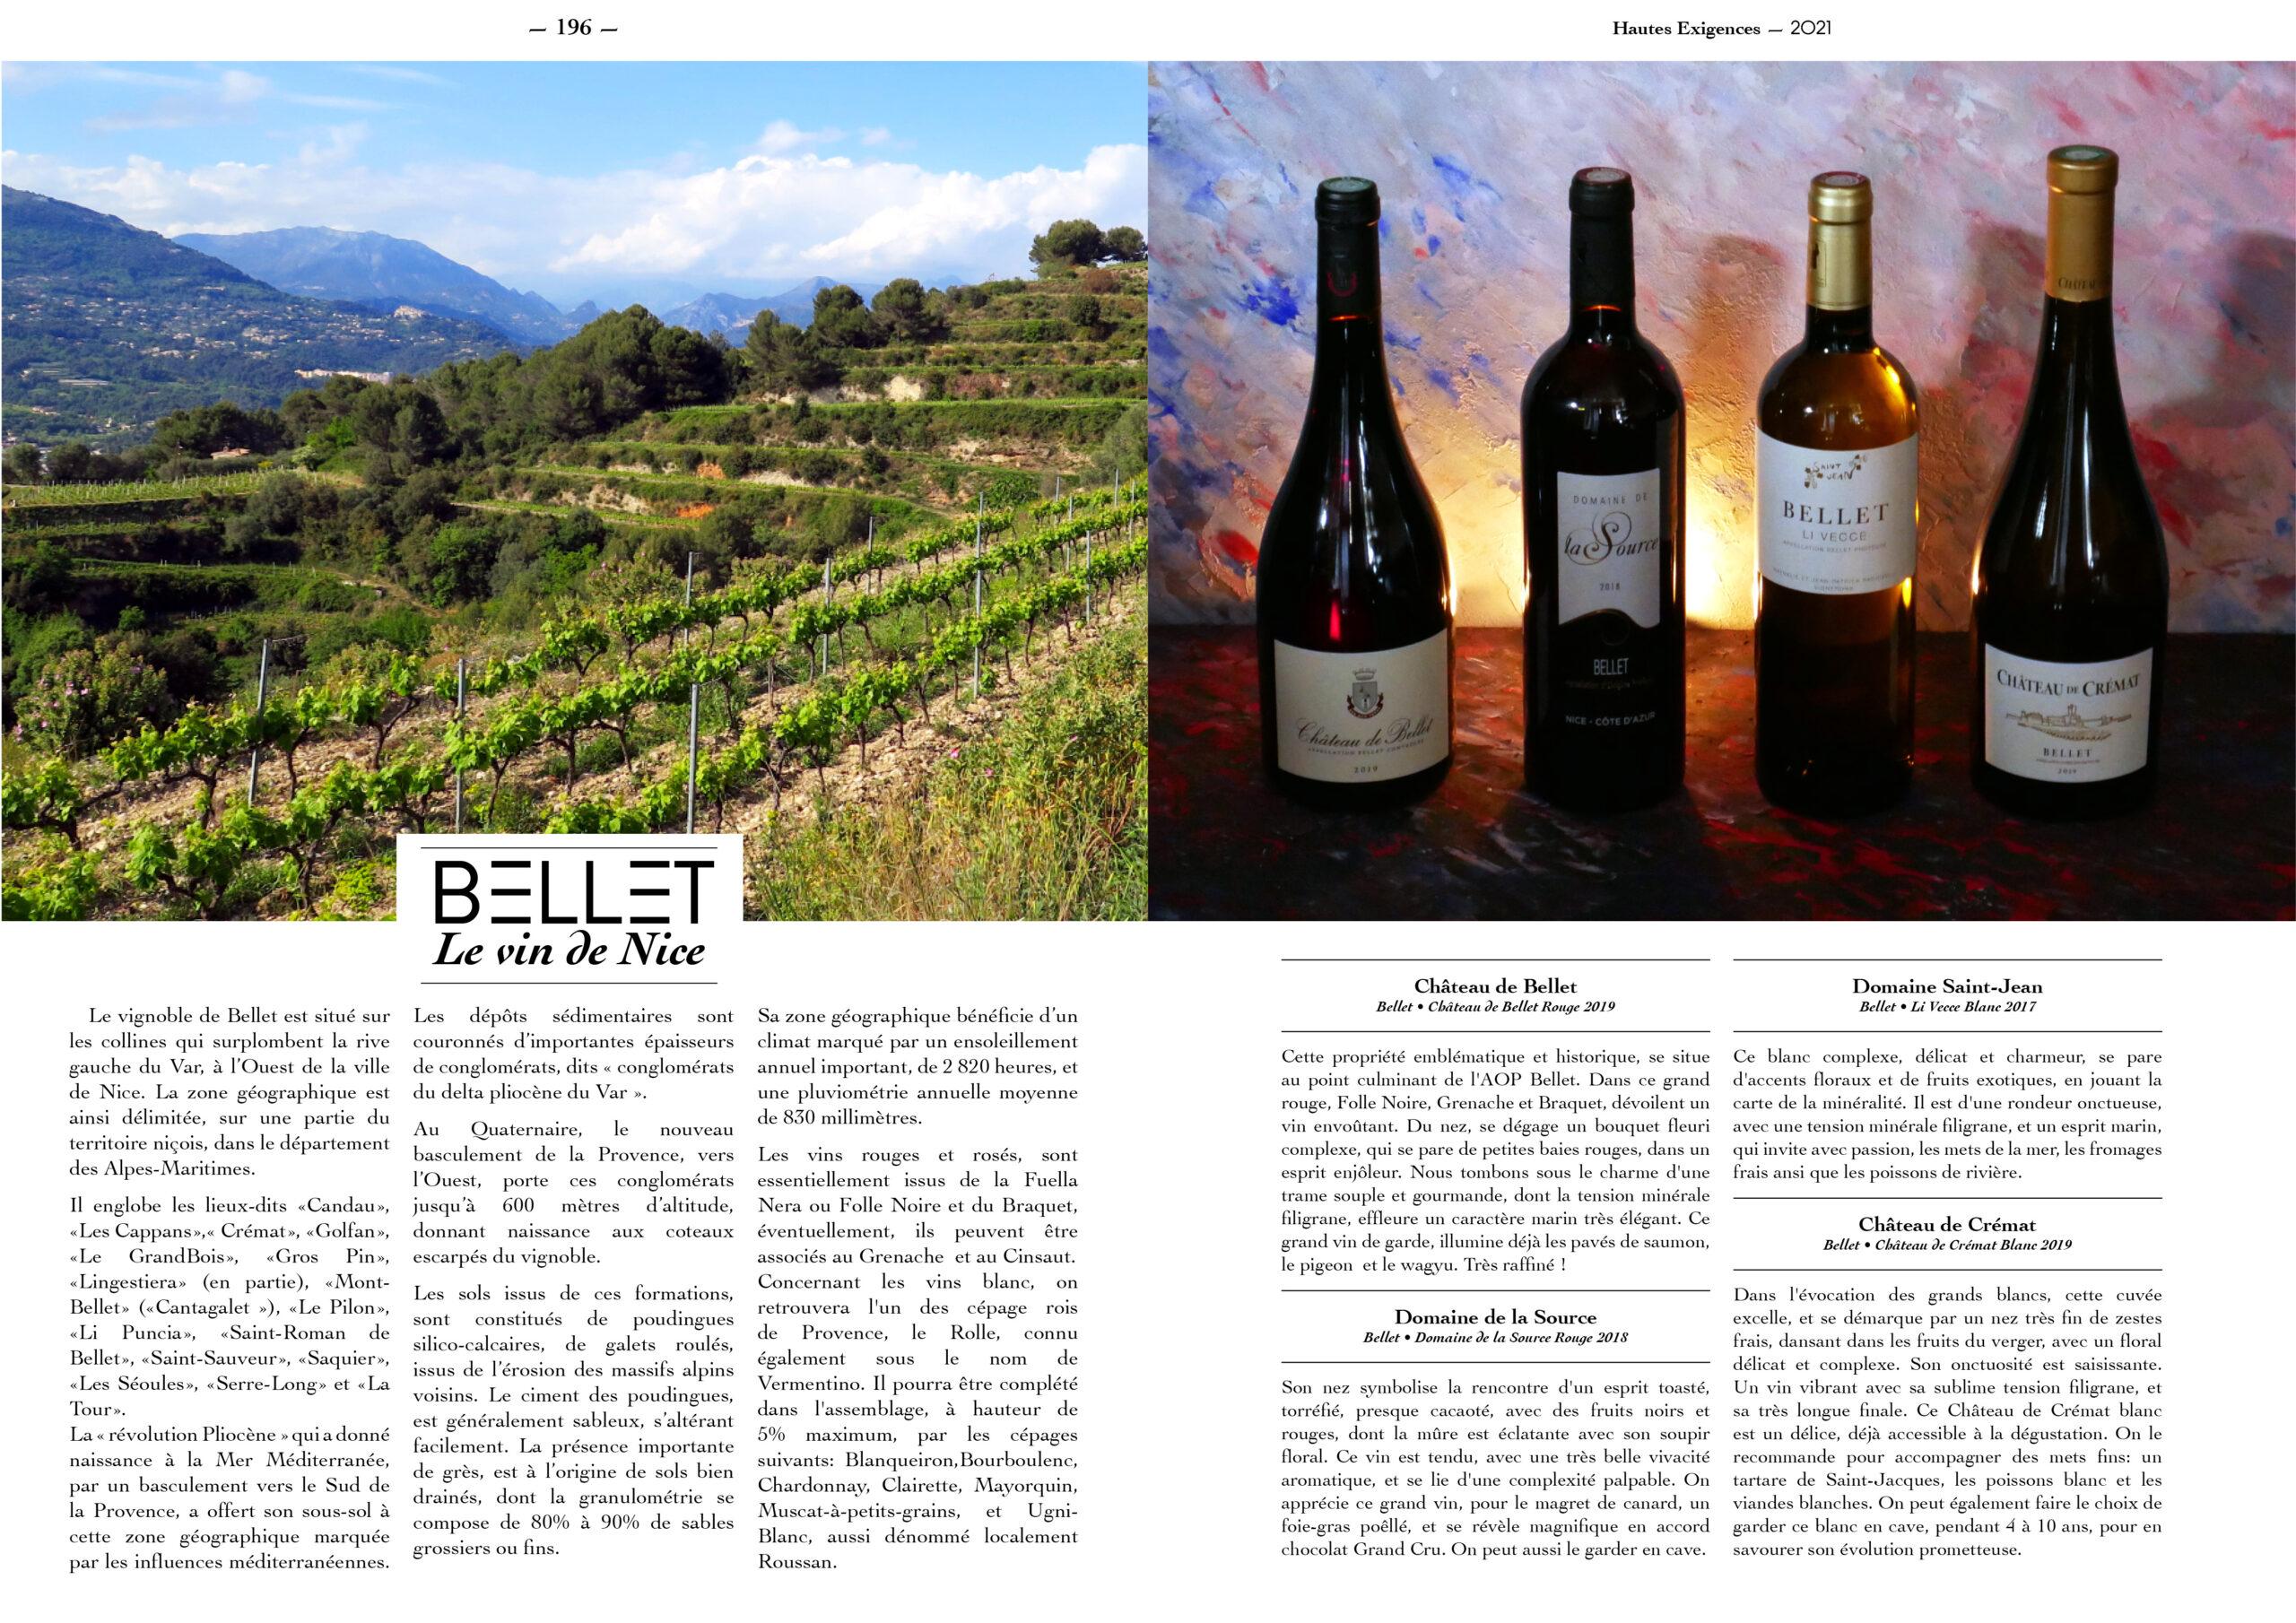 Hautes Exigences Magazine Hors Serie 2021 page 194-195